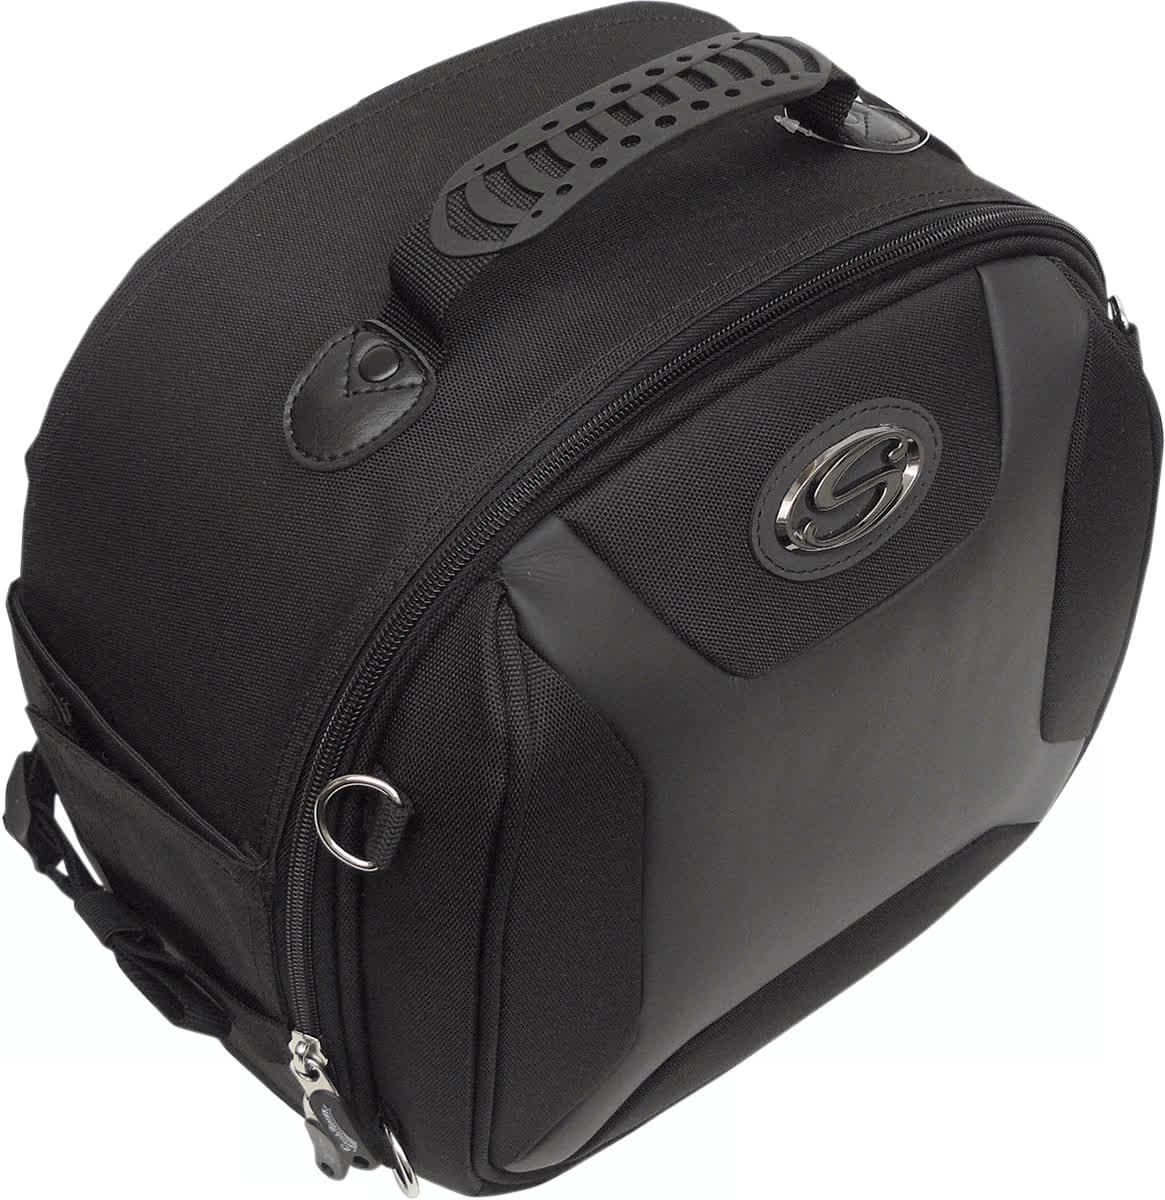 Saddlemen 3515-0138 FTB1000 Sport Sissy Bar Bag